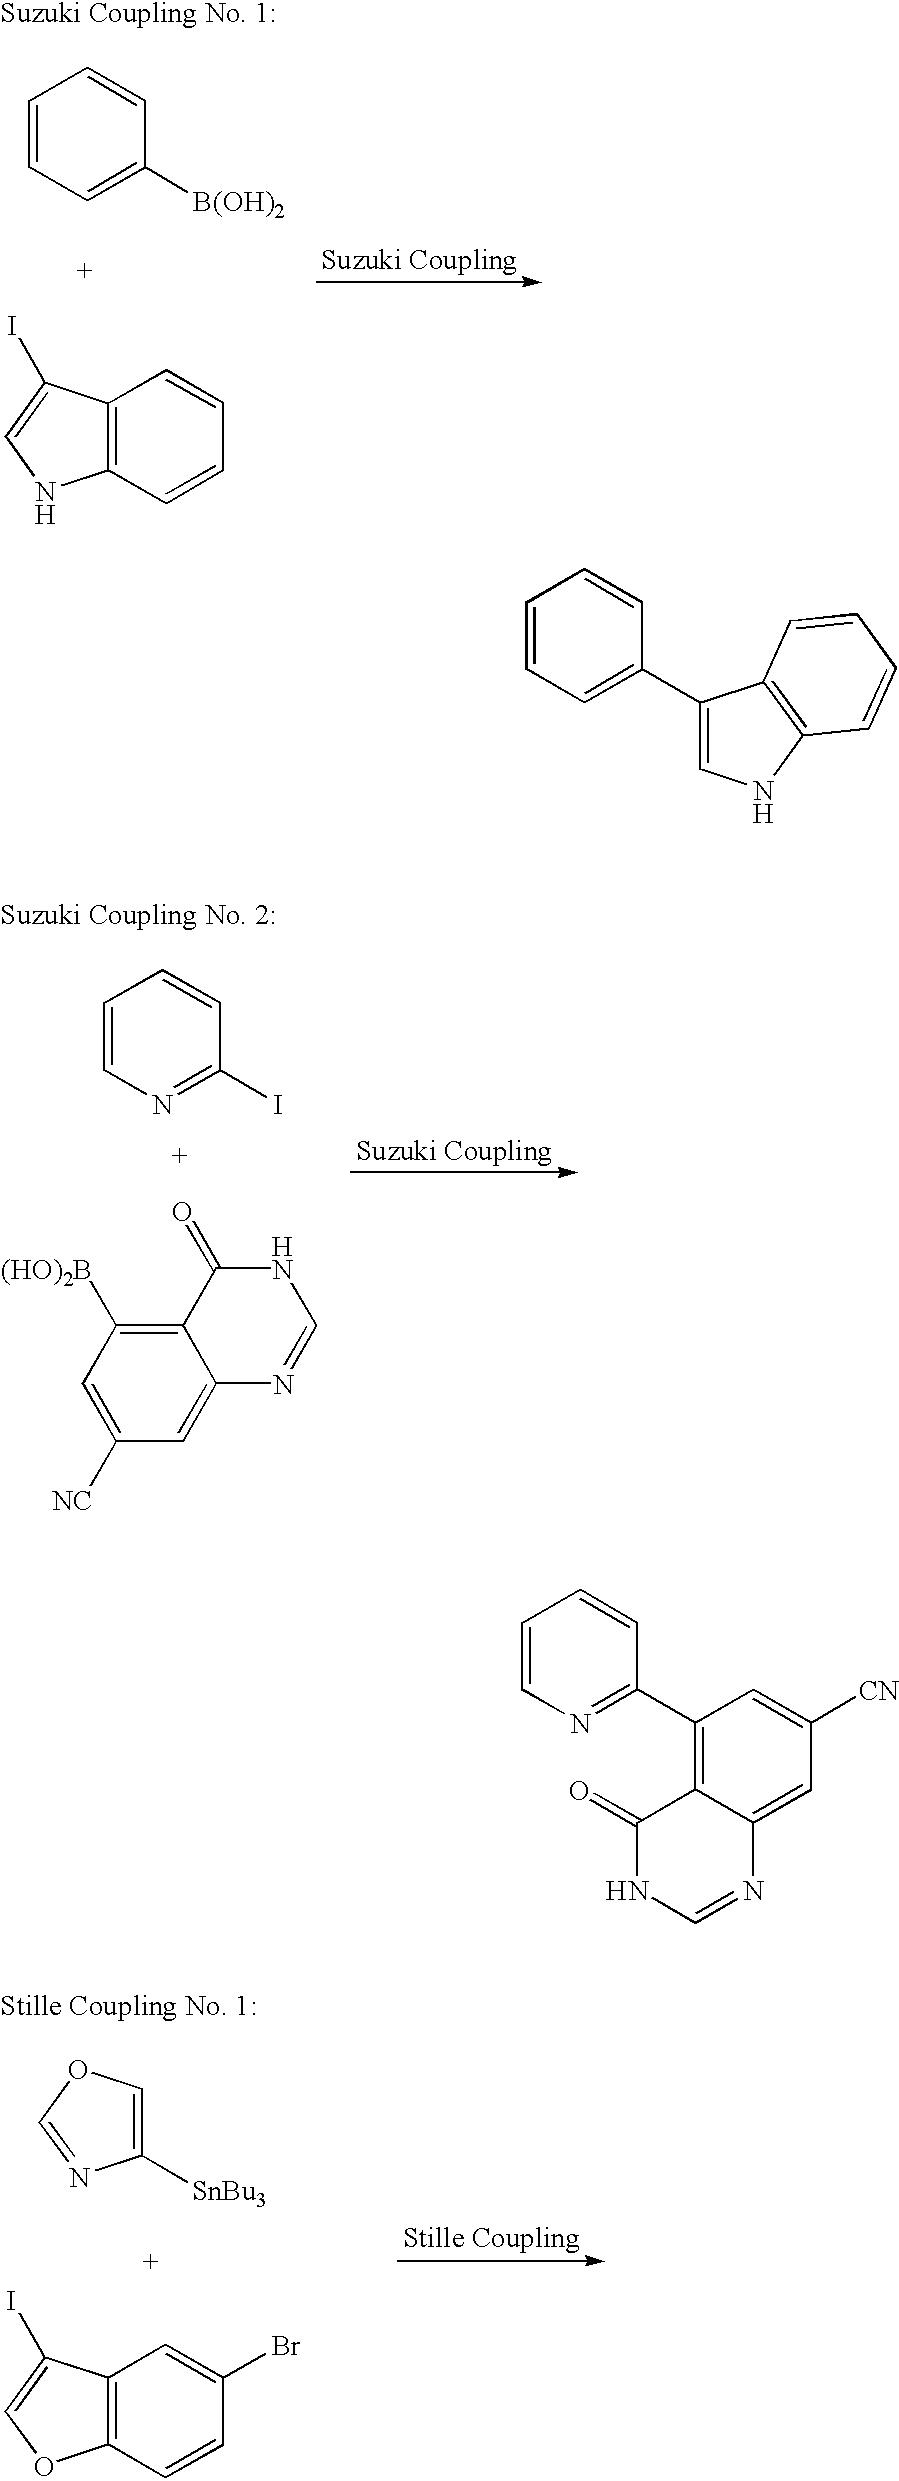 Us7115653b2 Small Organic Molecule Regulators Of Cell Alkaline Battery Schematic Experimenter39s Corner Issue Figure Us07115653 20061003 C00042